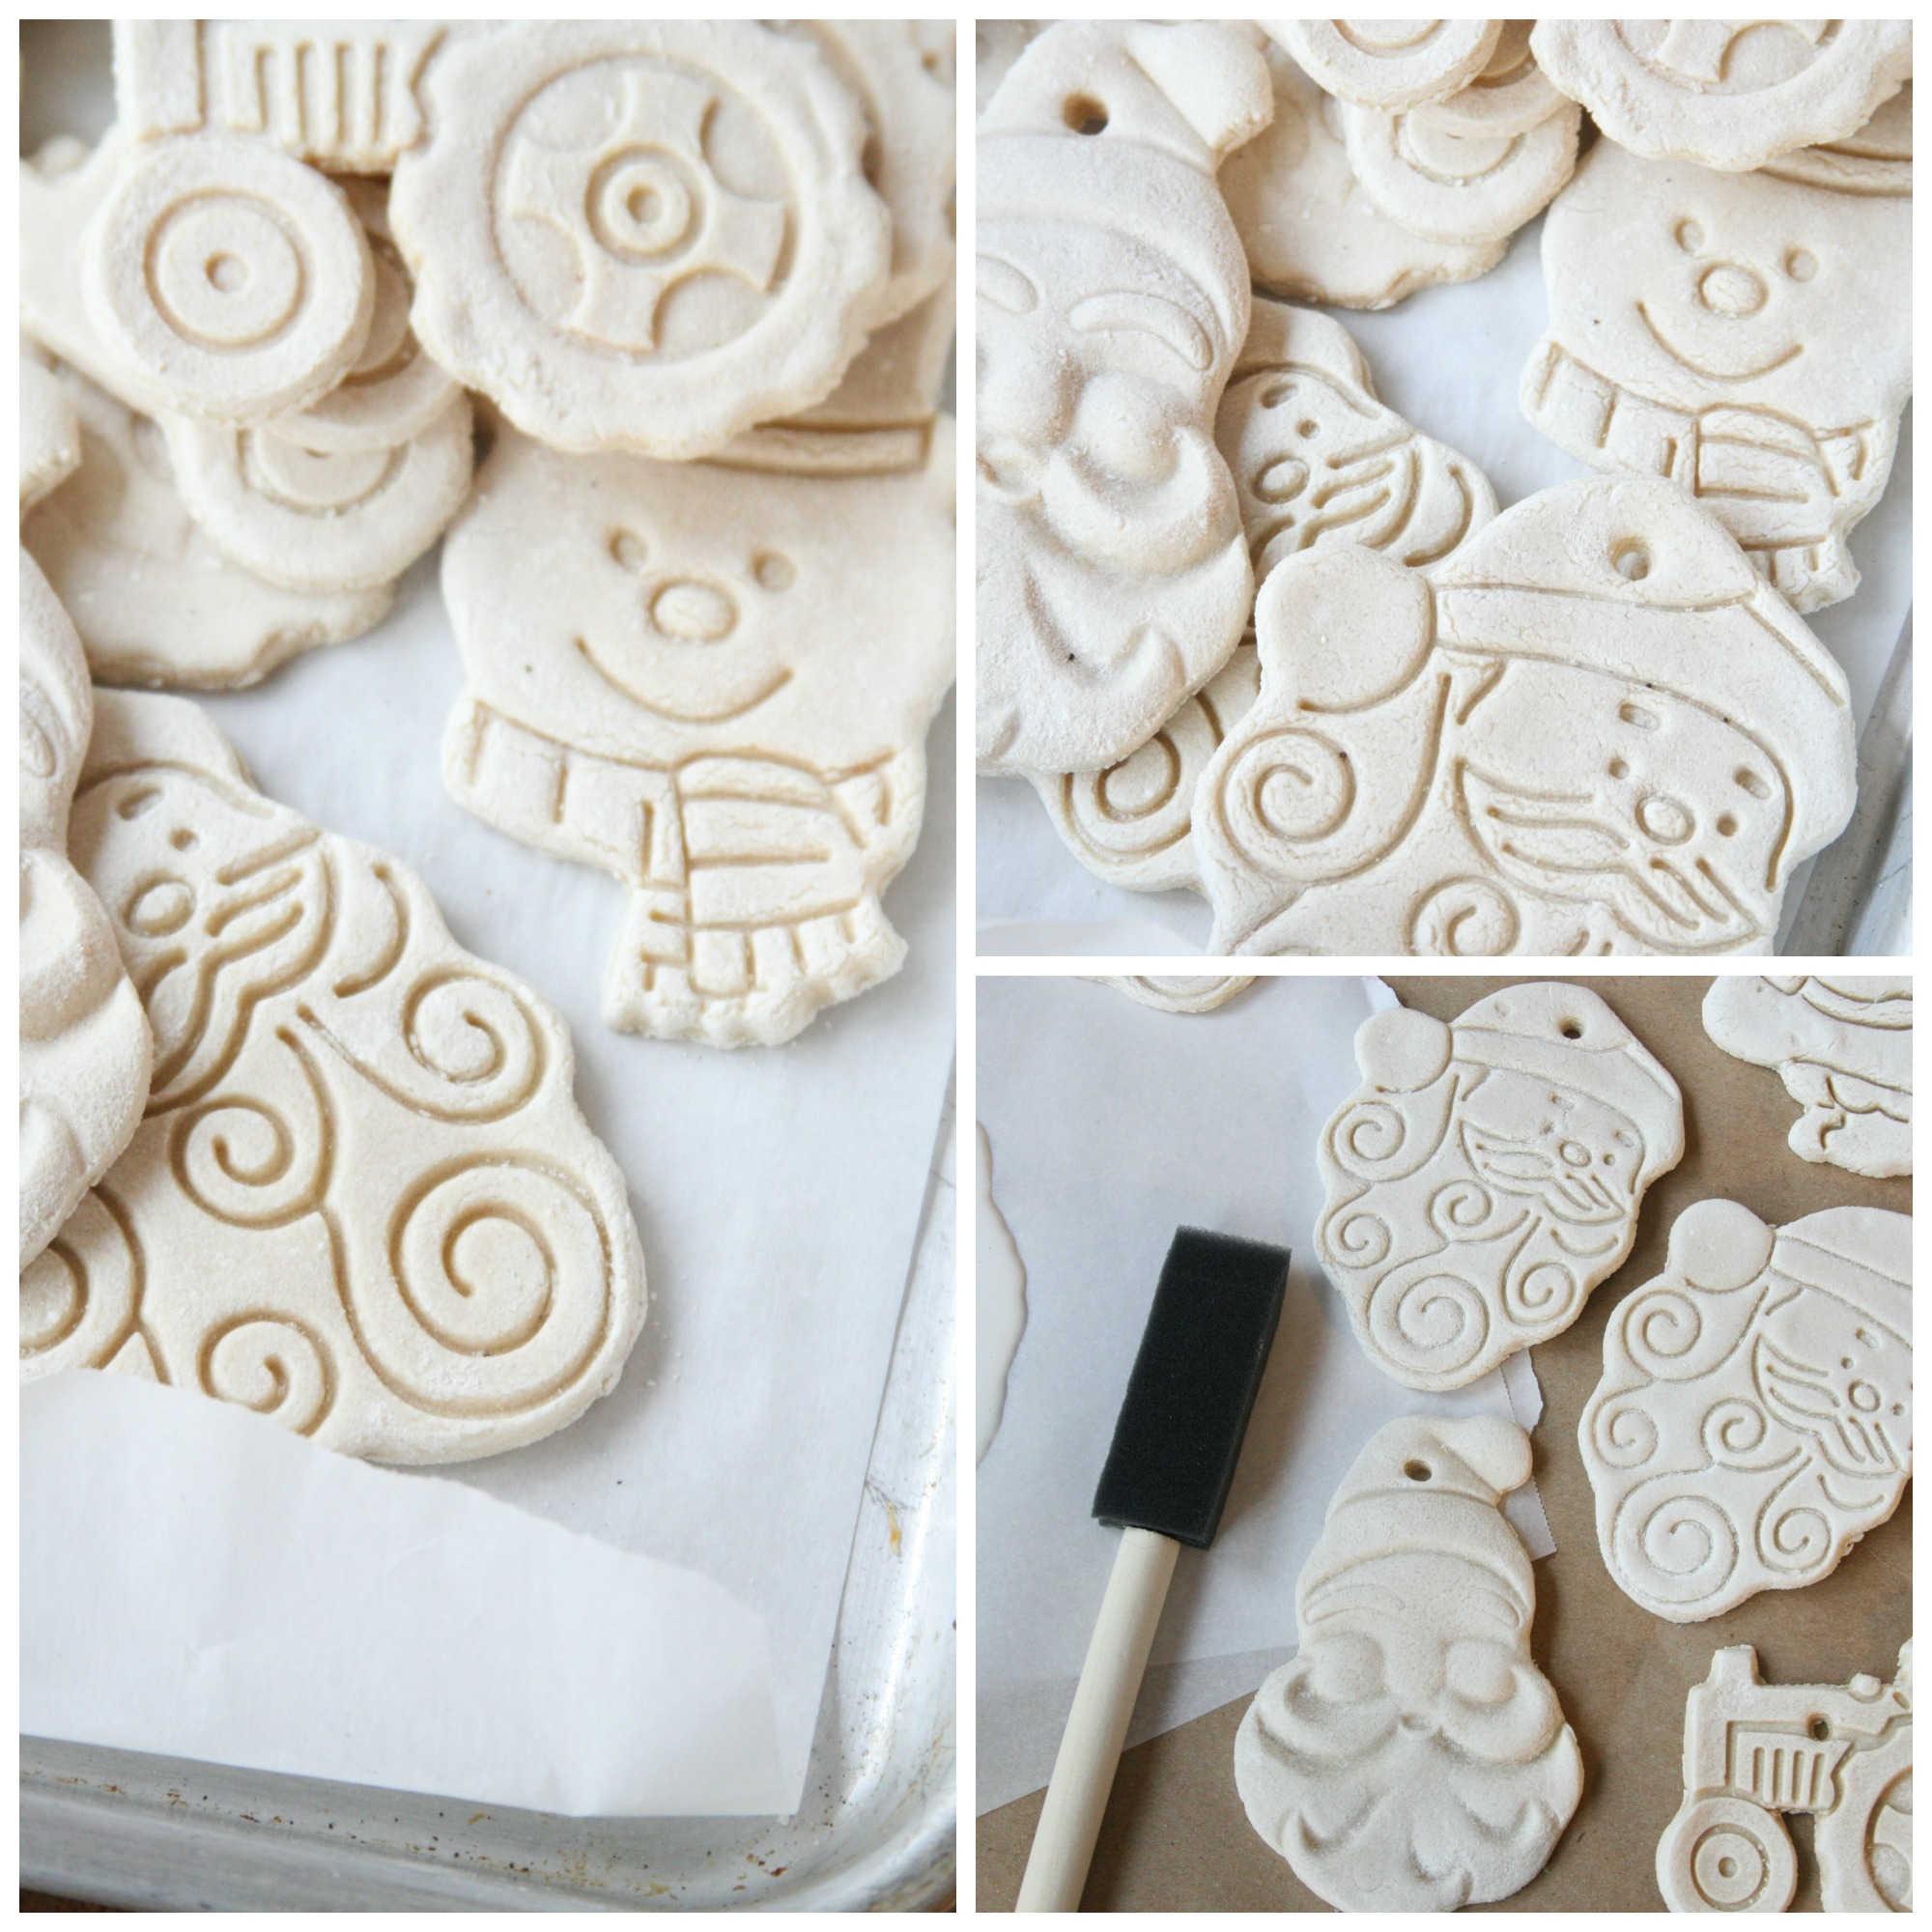 Step images of salt dough ornaments on brown Kraft paper.